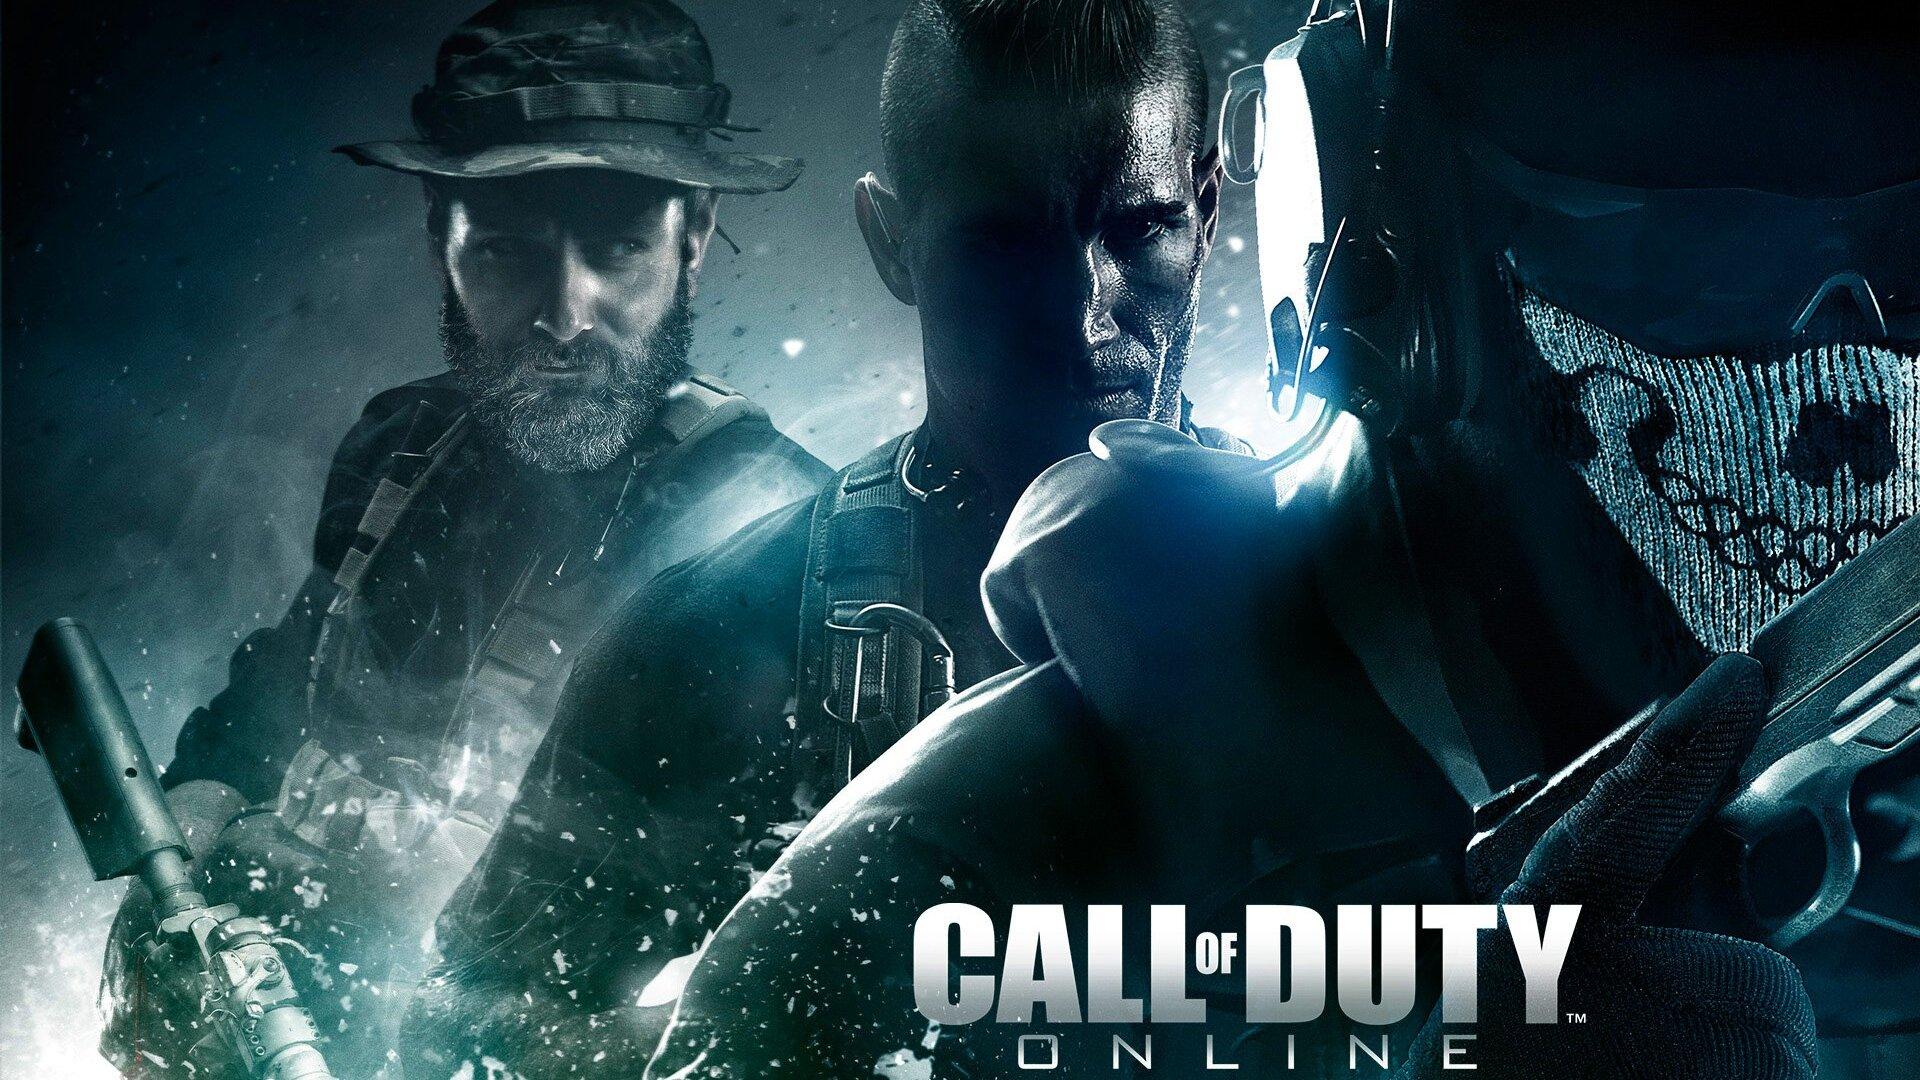 1920x1080 Call Of Duty Online Game Laptop Full Hd 1080p Hd 4k